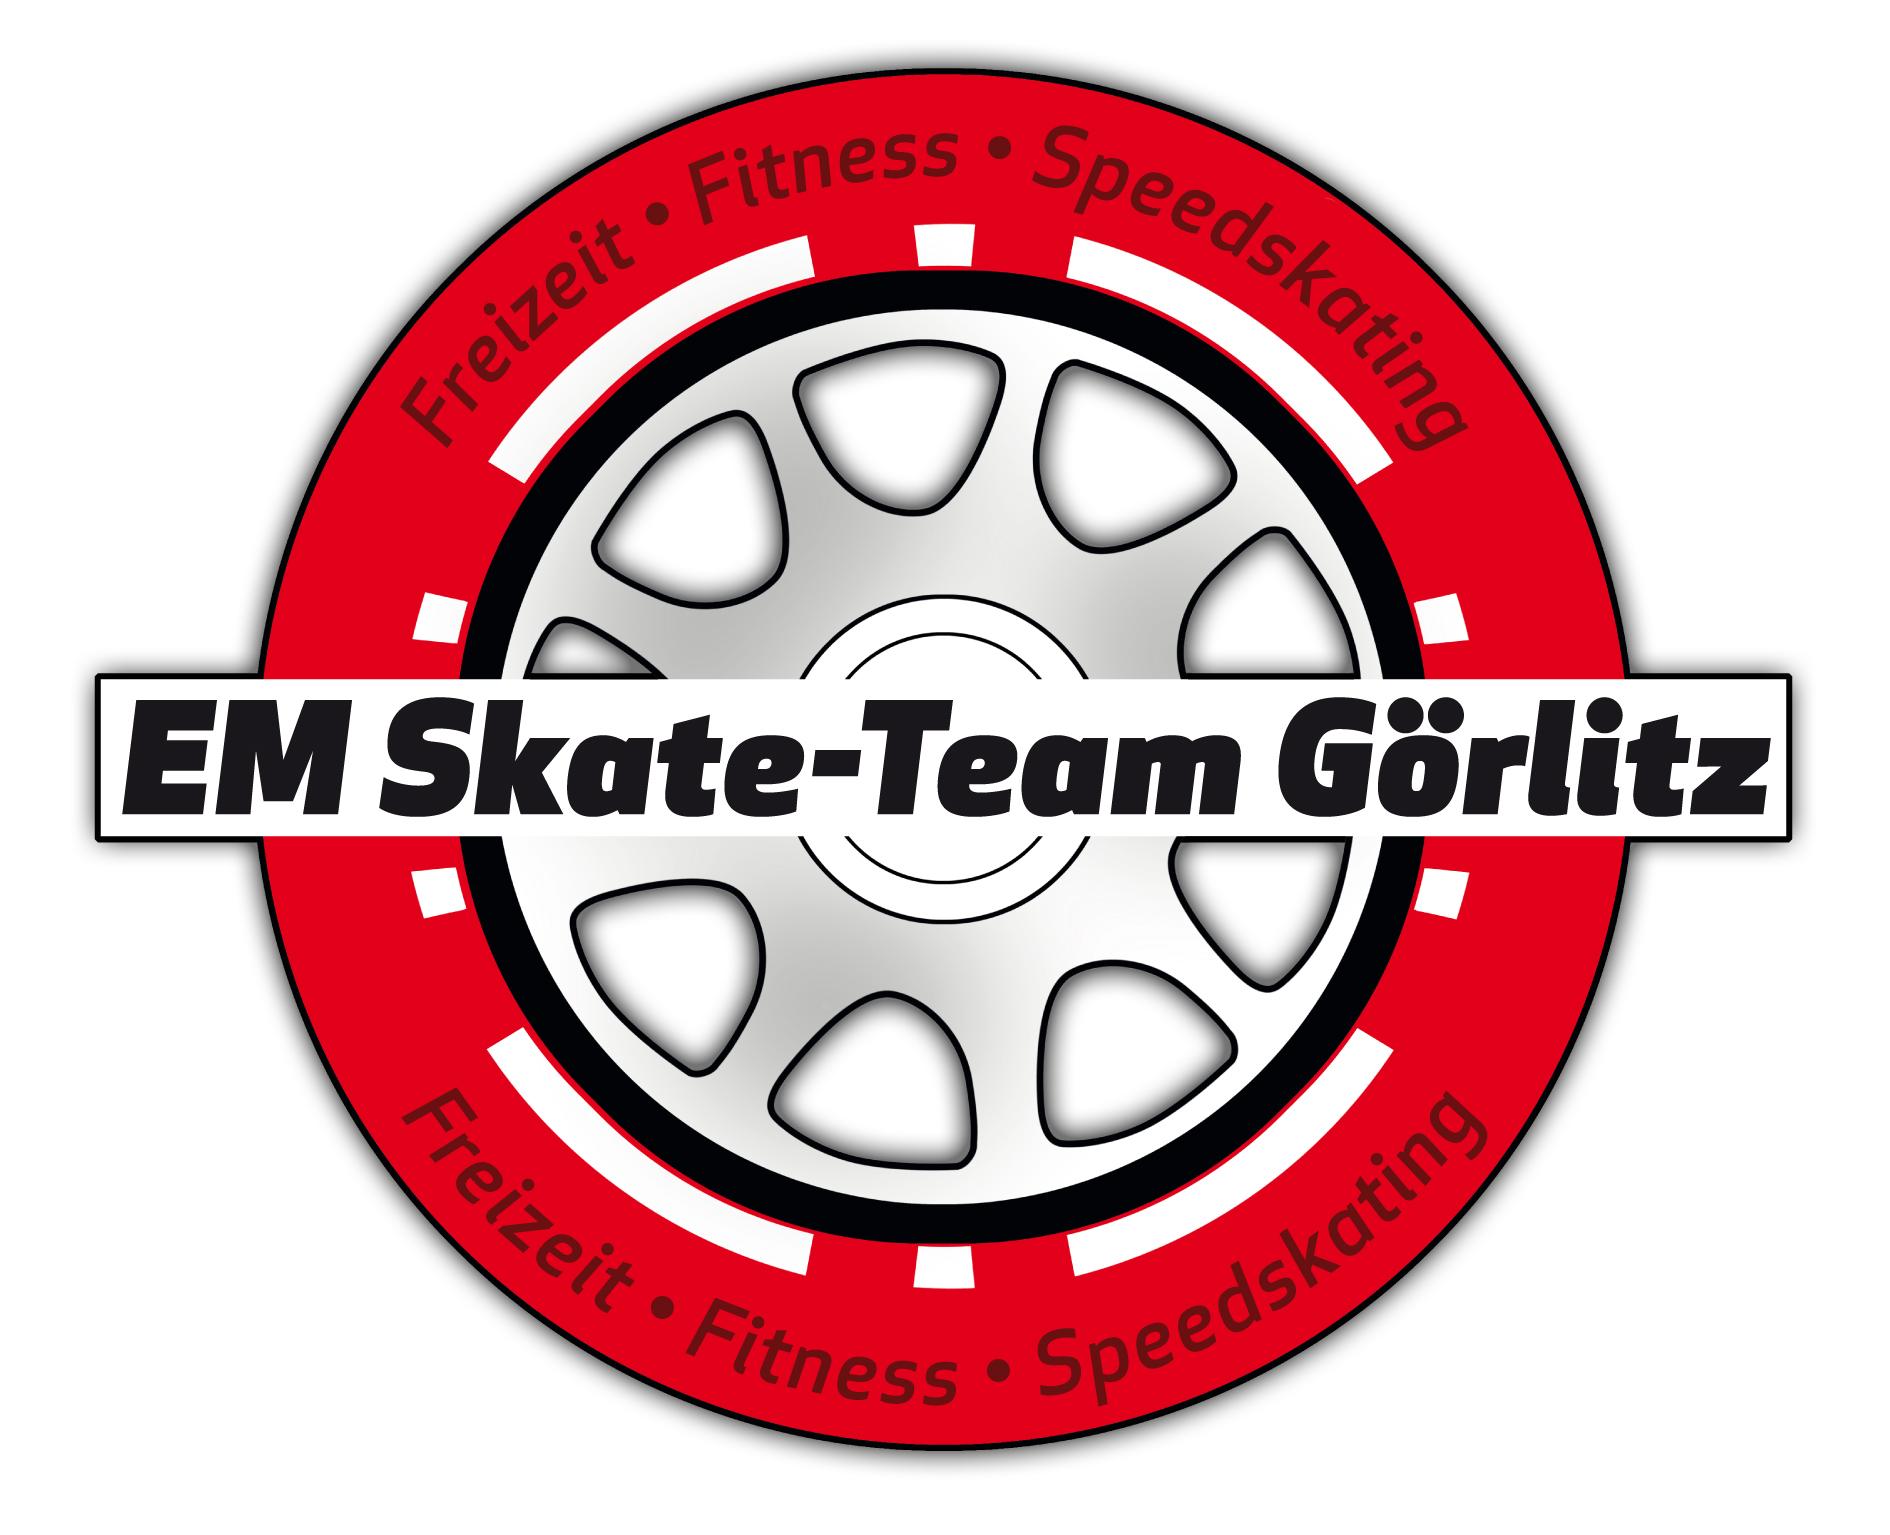 EM Skate-Team